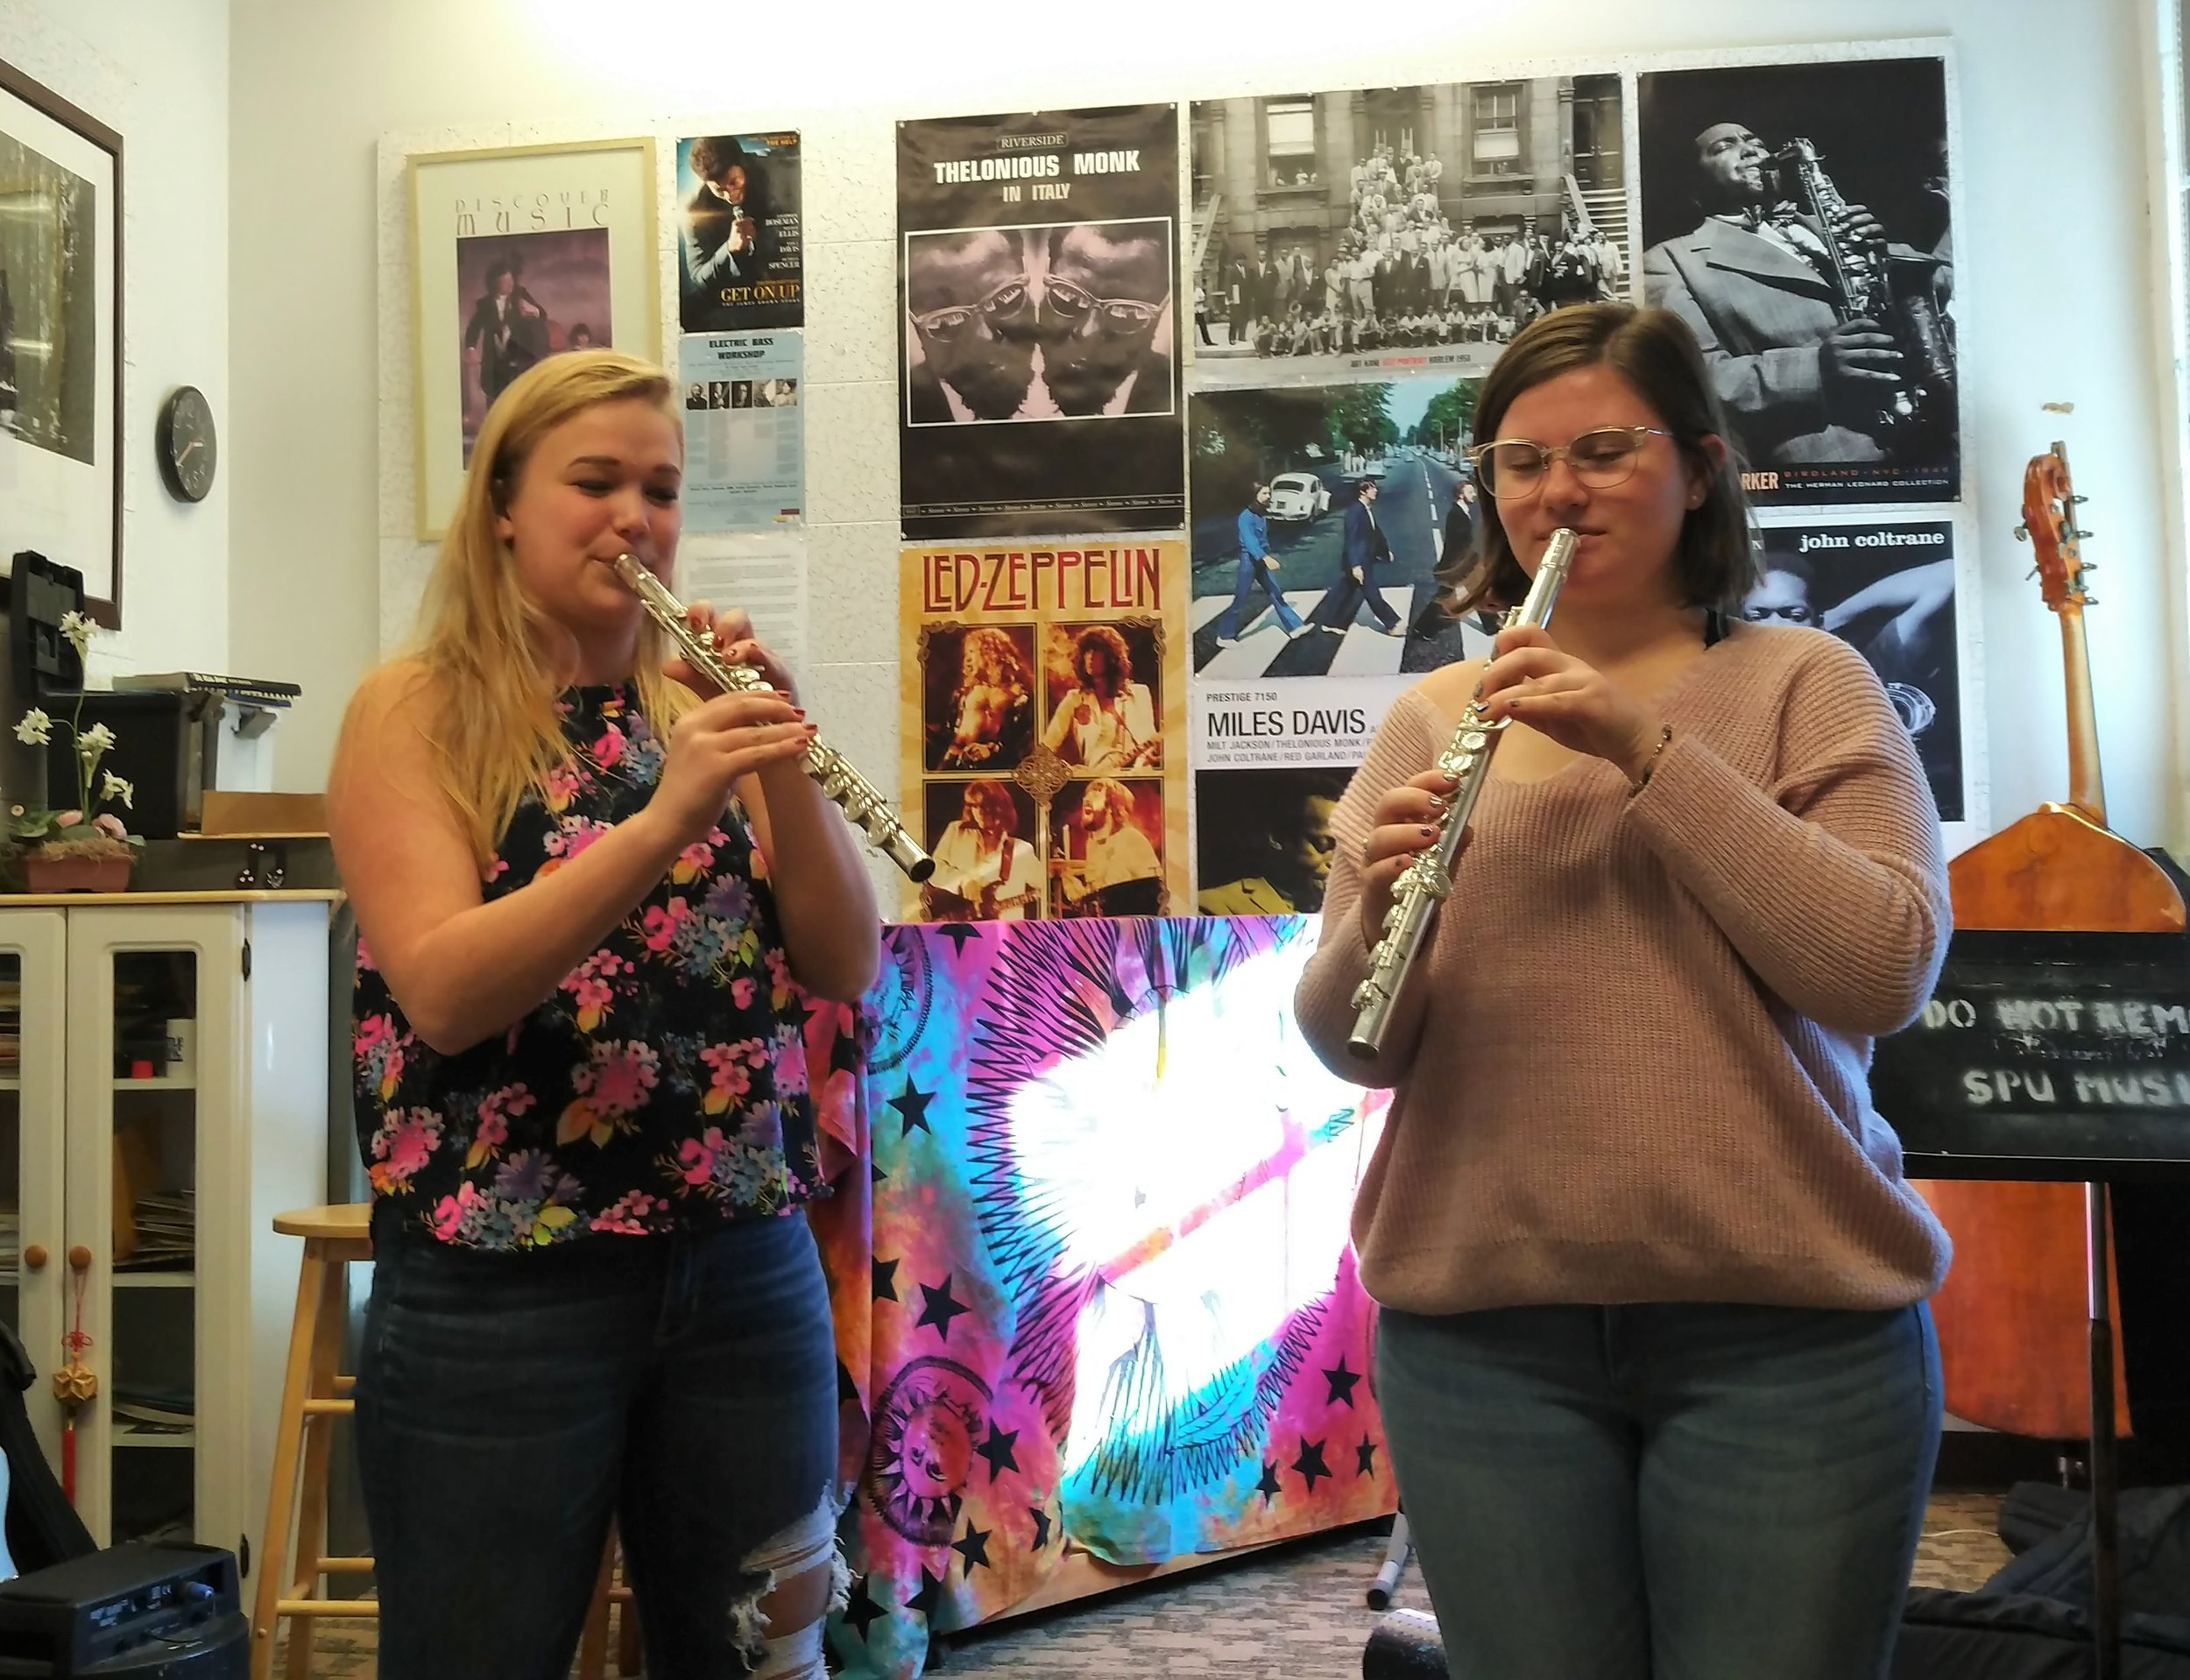 SPU Flutes